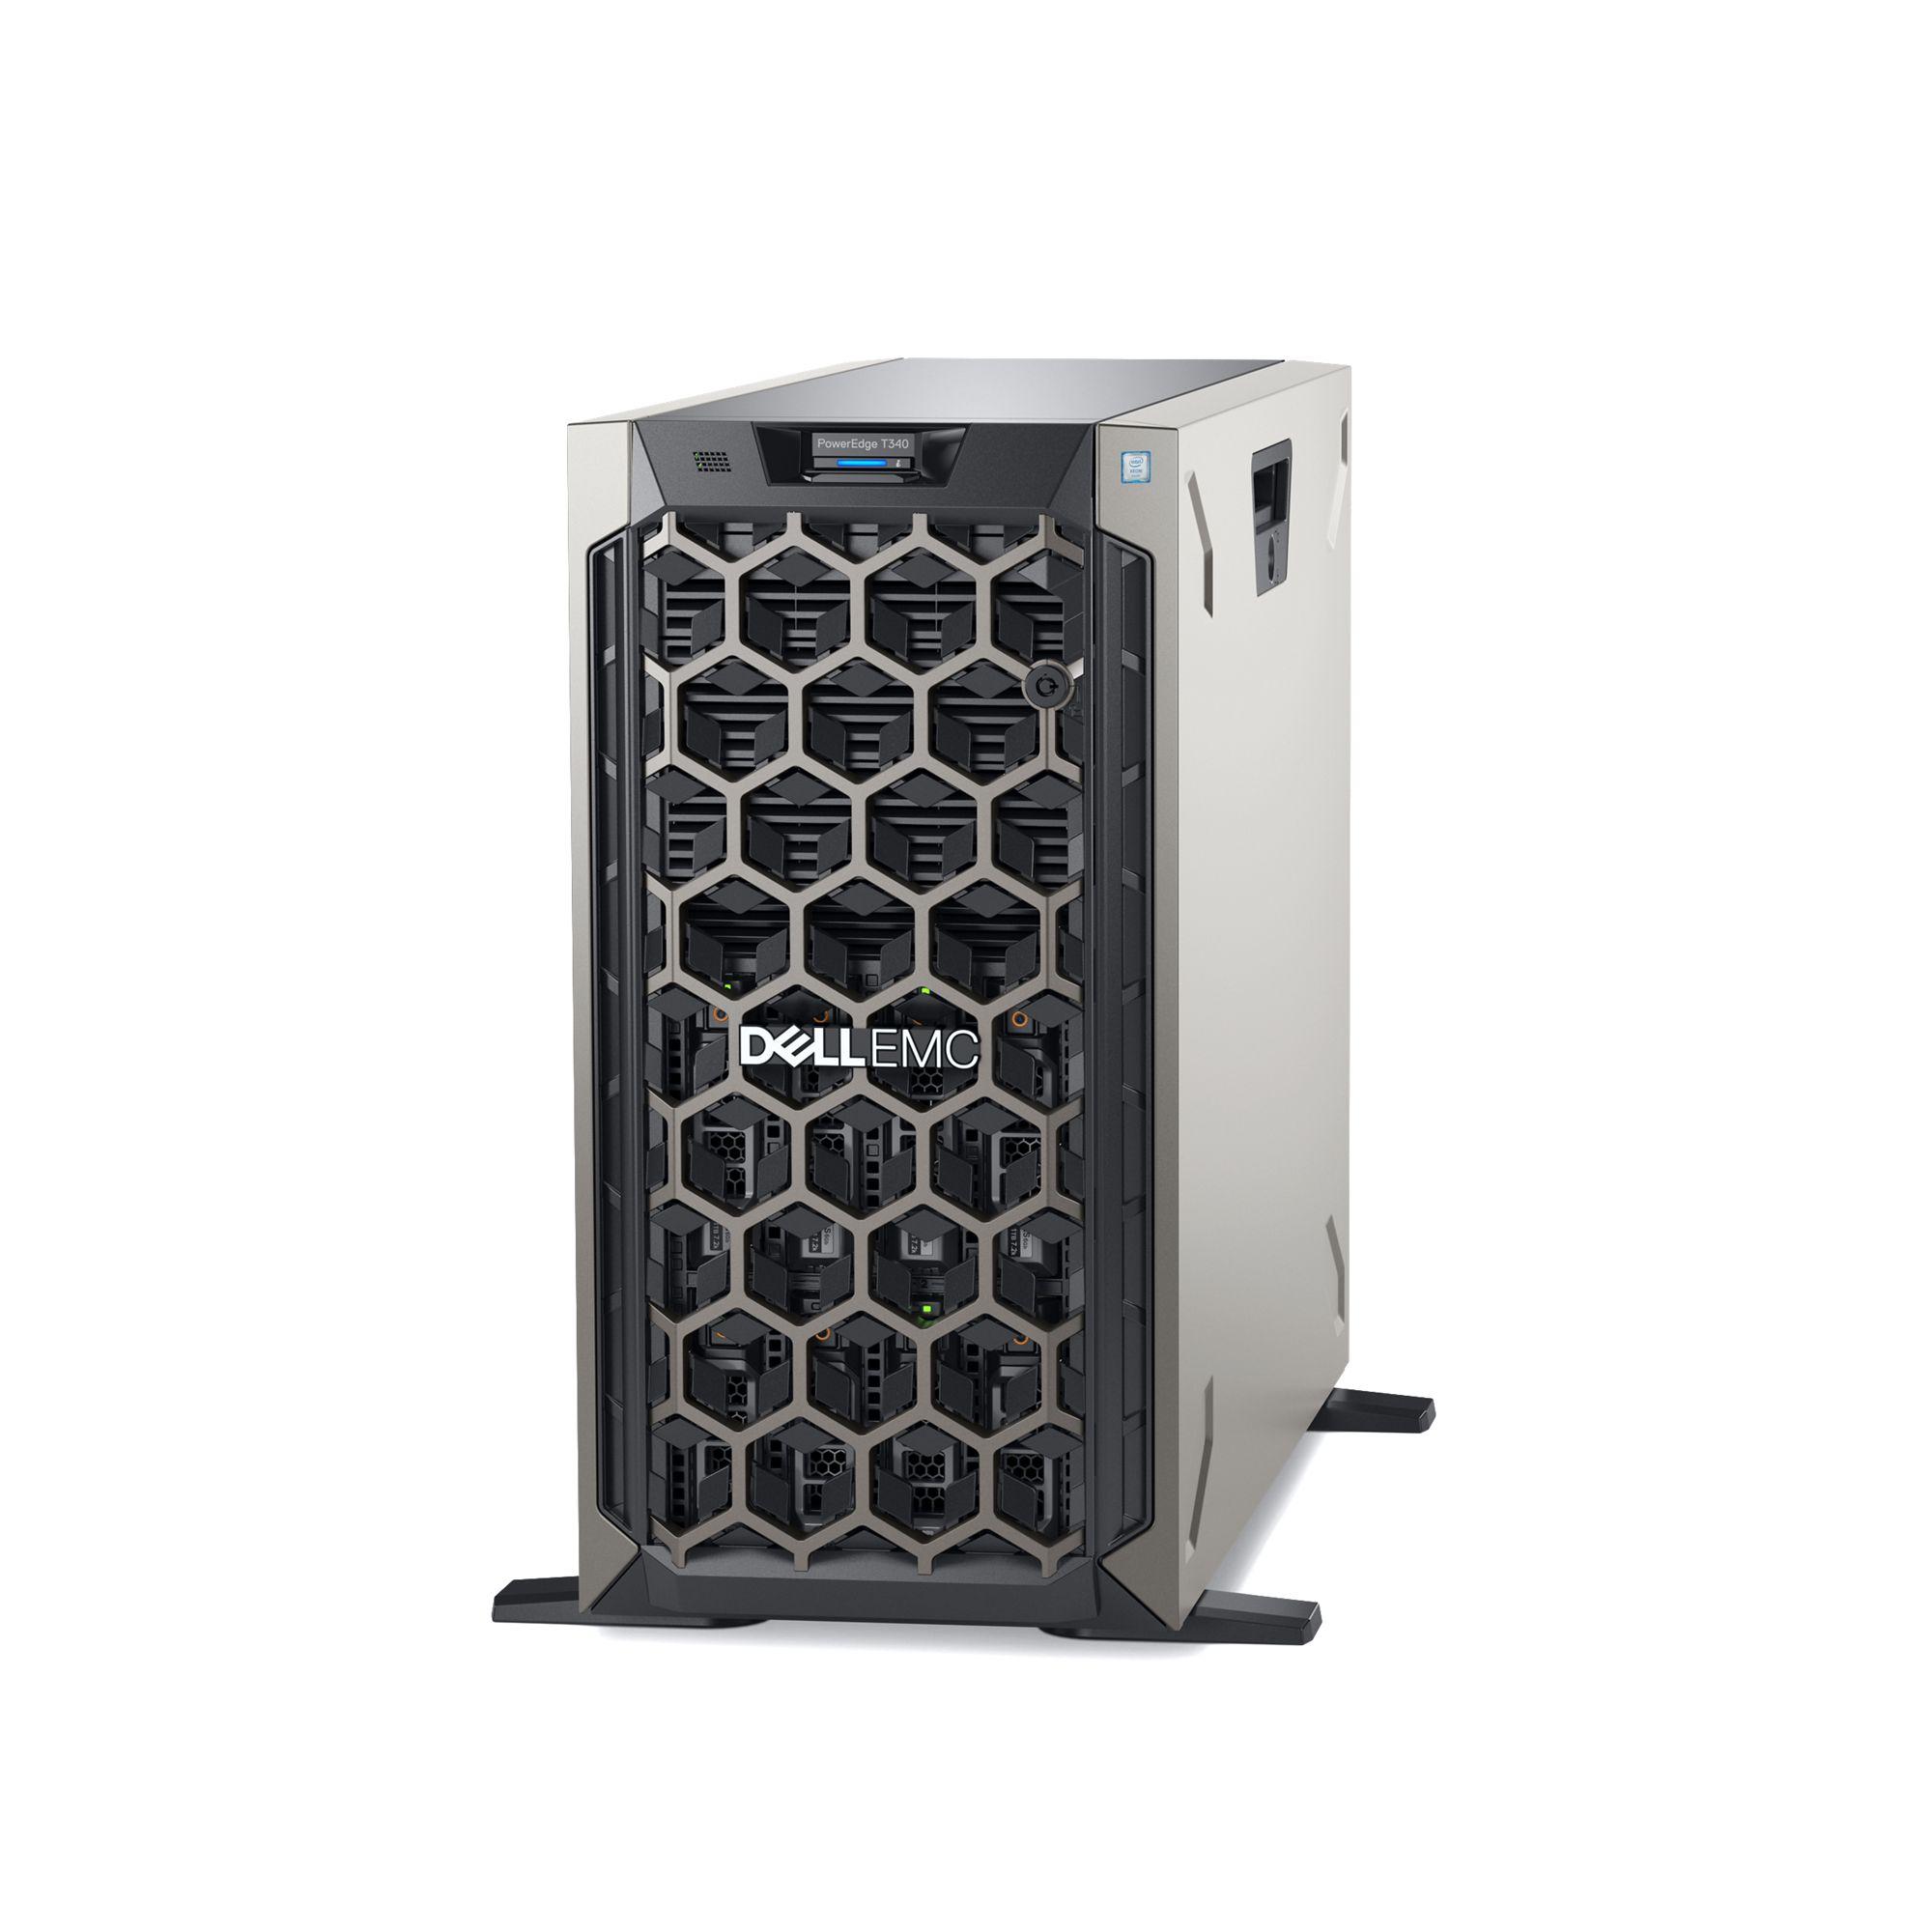 DELL server PowerEdge T340 E-2124/ 16G/ 2x 4TB NL-SAS/ H330+/ iDrac-Basic / 1x350W/ 3NBD Basic